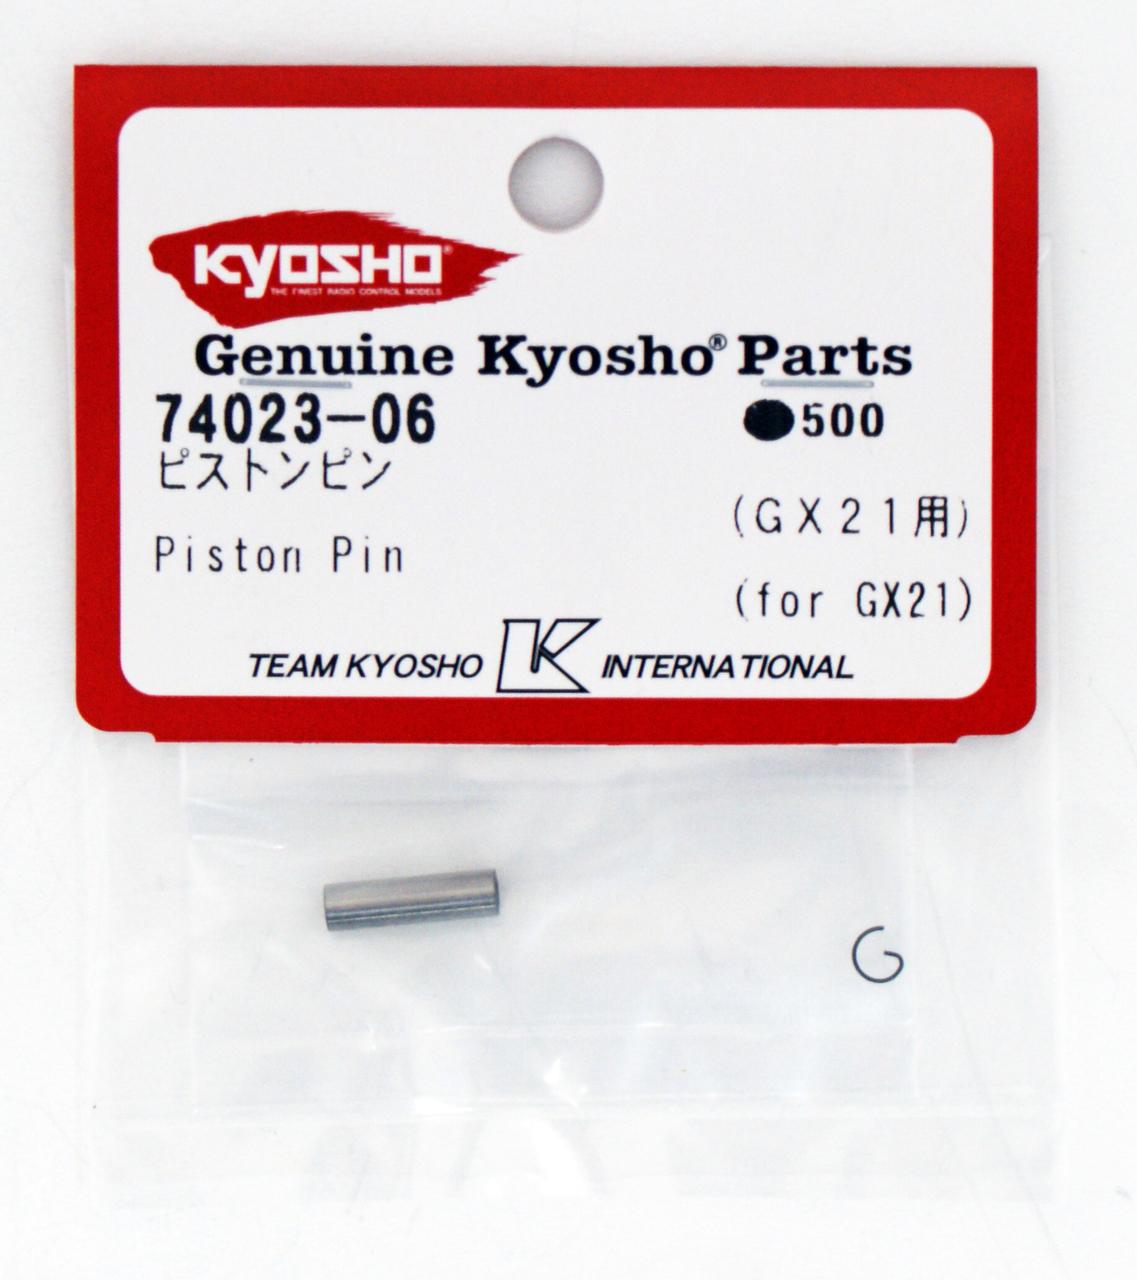 Kyosho GX21 Piston Pin